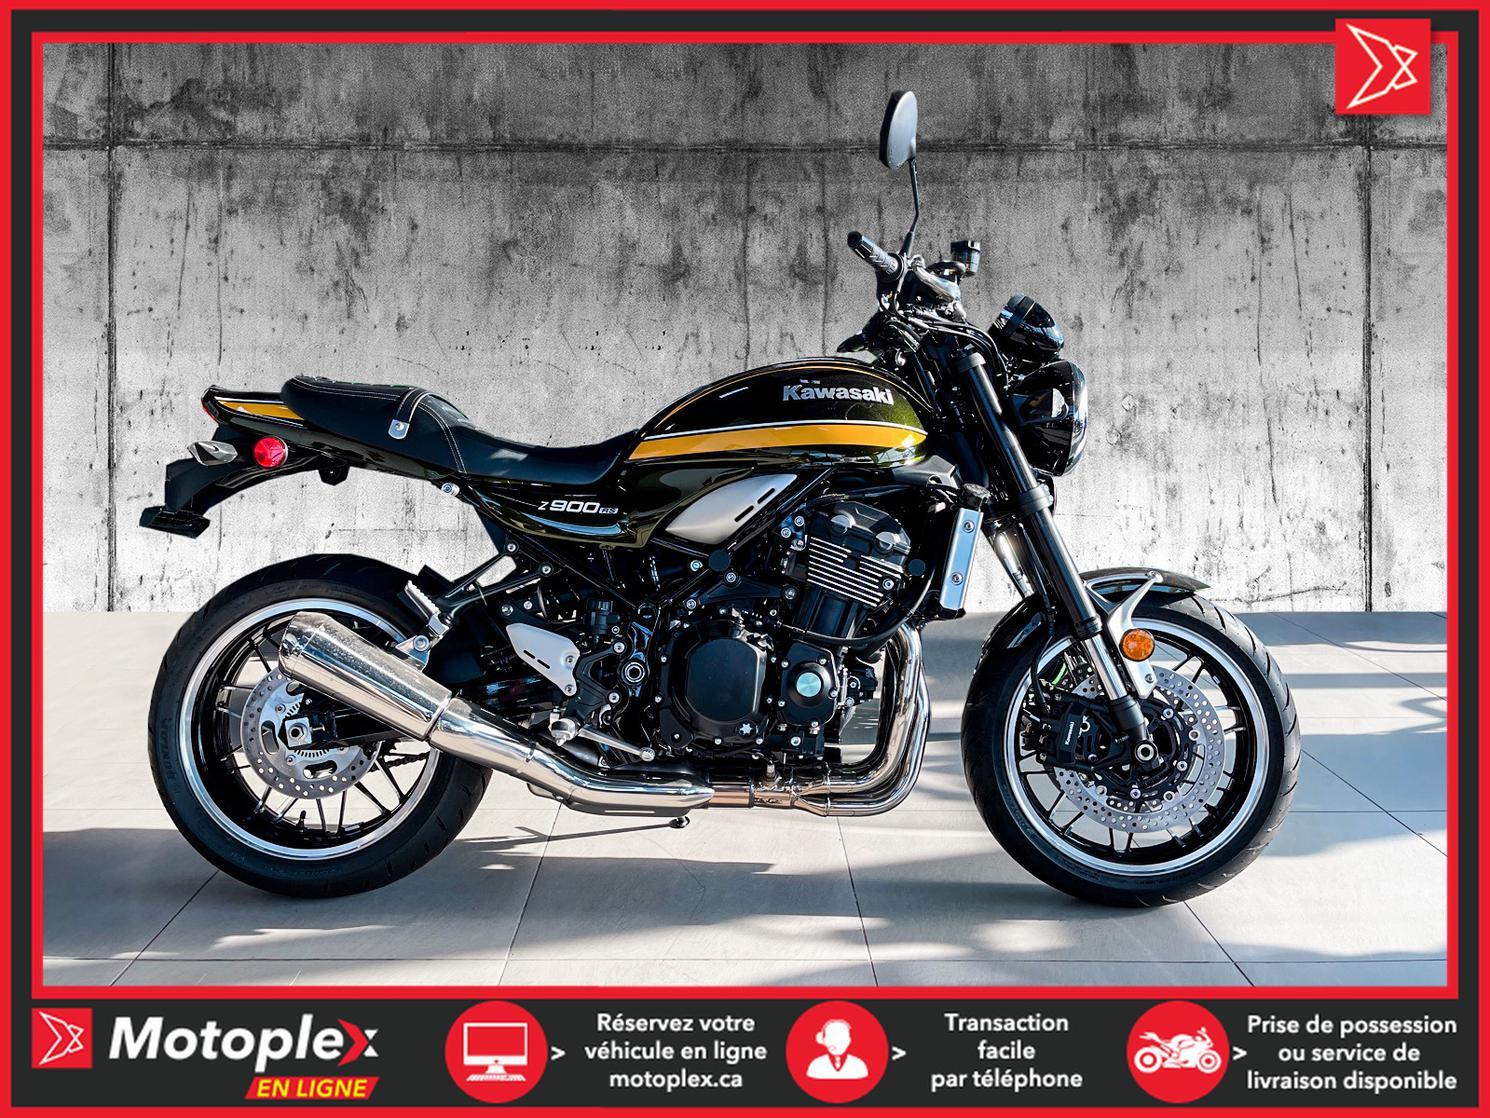 KM21NL Kawasaki Z900RS SPECIAL EDITION (SE) 2020